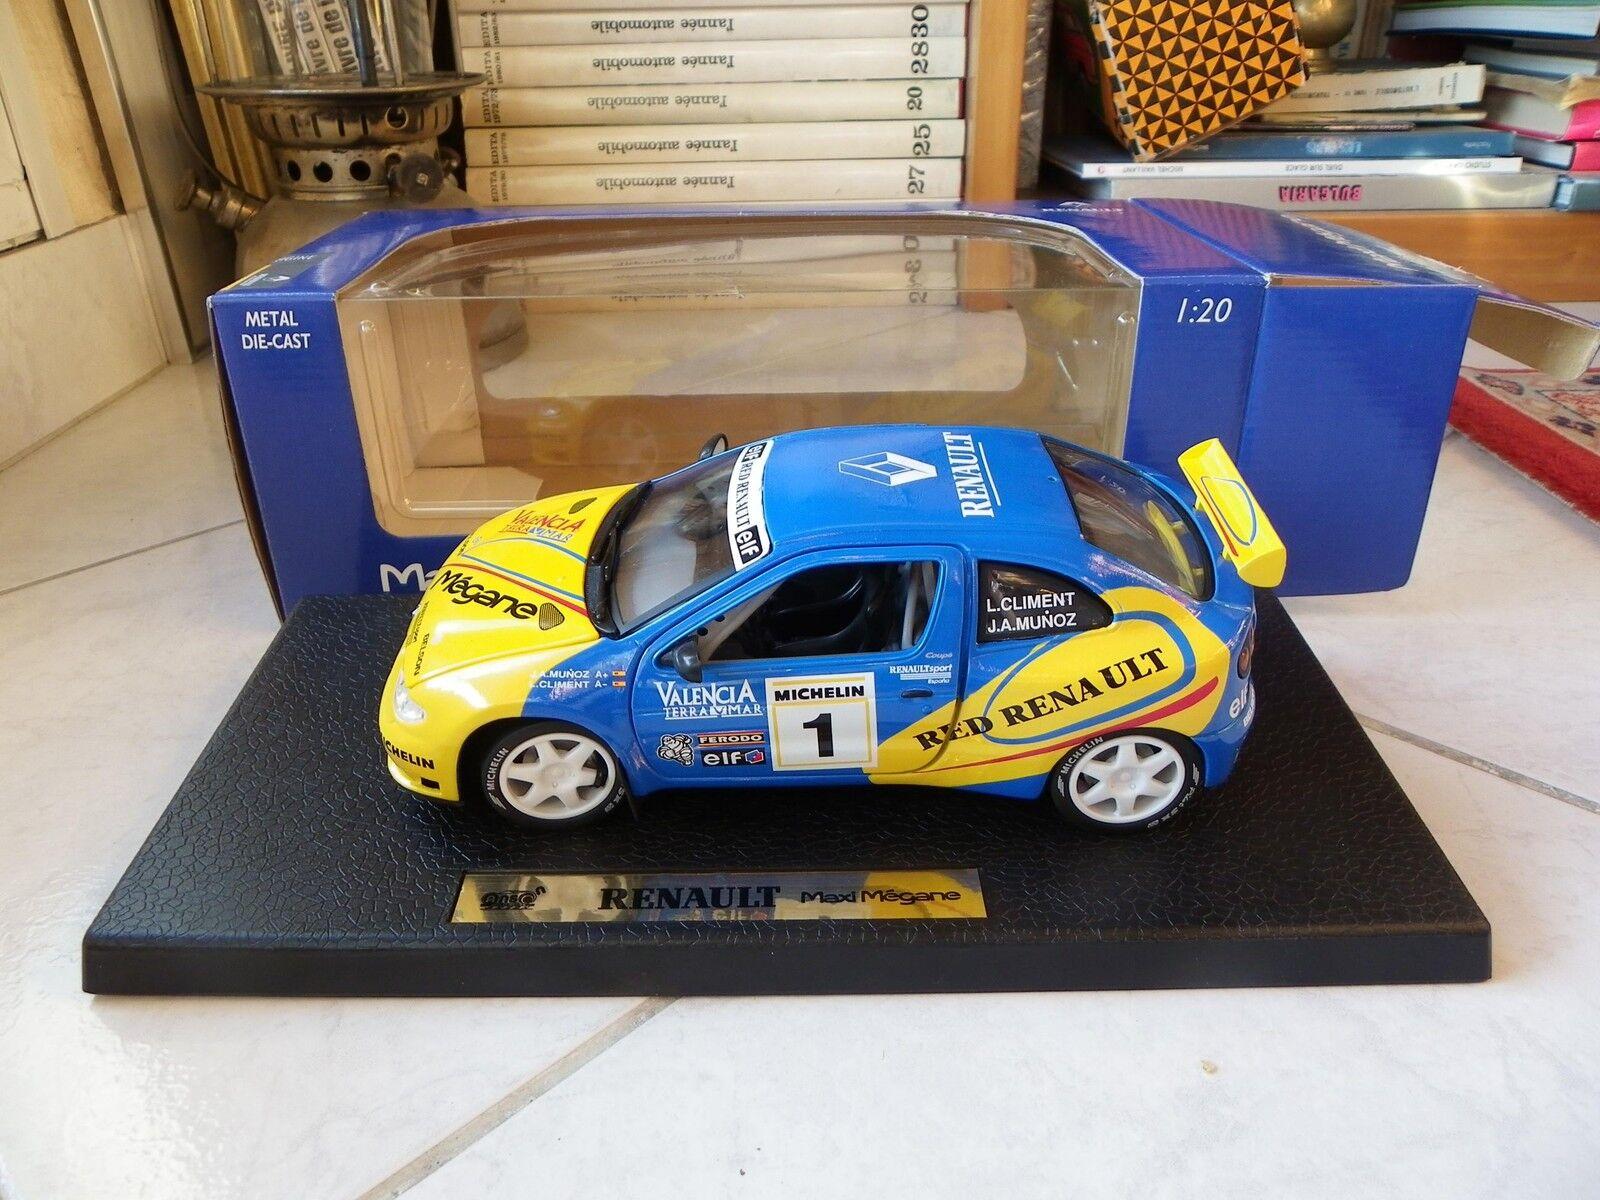 Renault Maxi Megane Climent Munoz N° 1 Anson 1 20 No 1 18 Miniatura